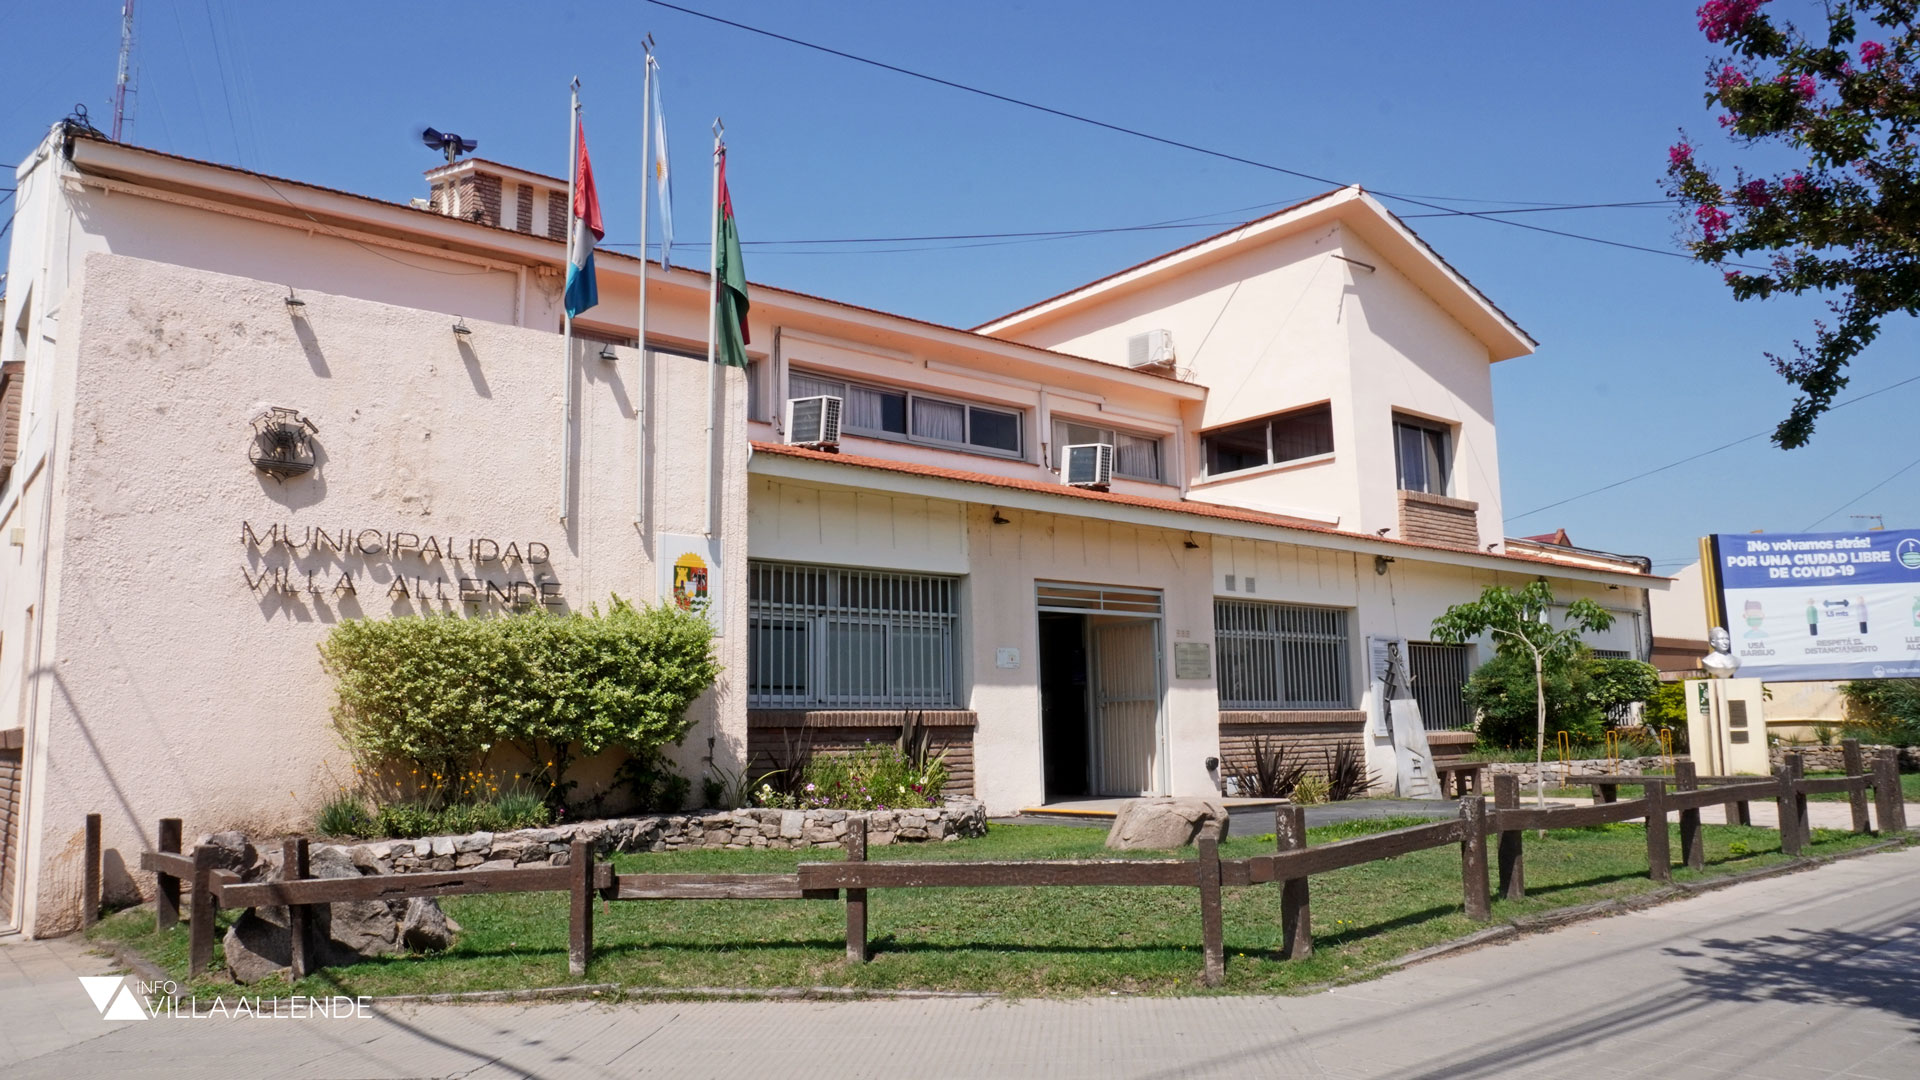 Villa Allende: cronograma de recolección de residuos por barrios